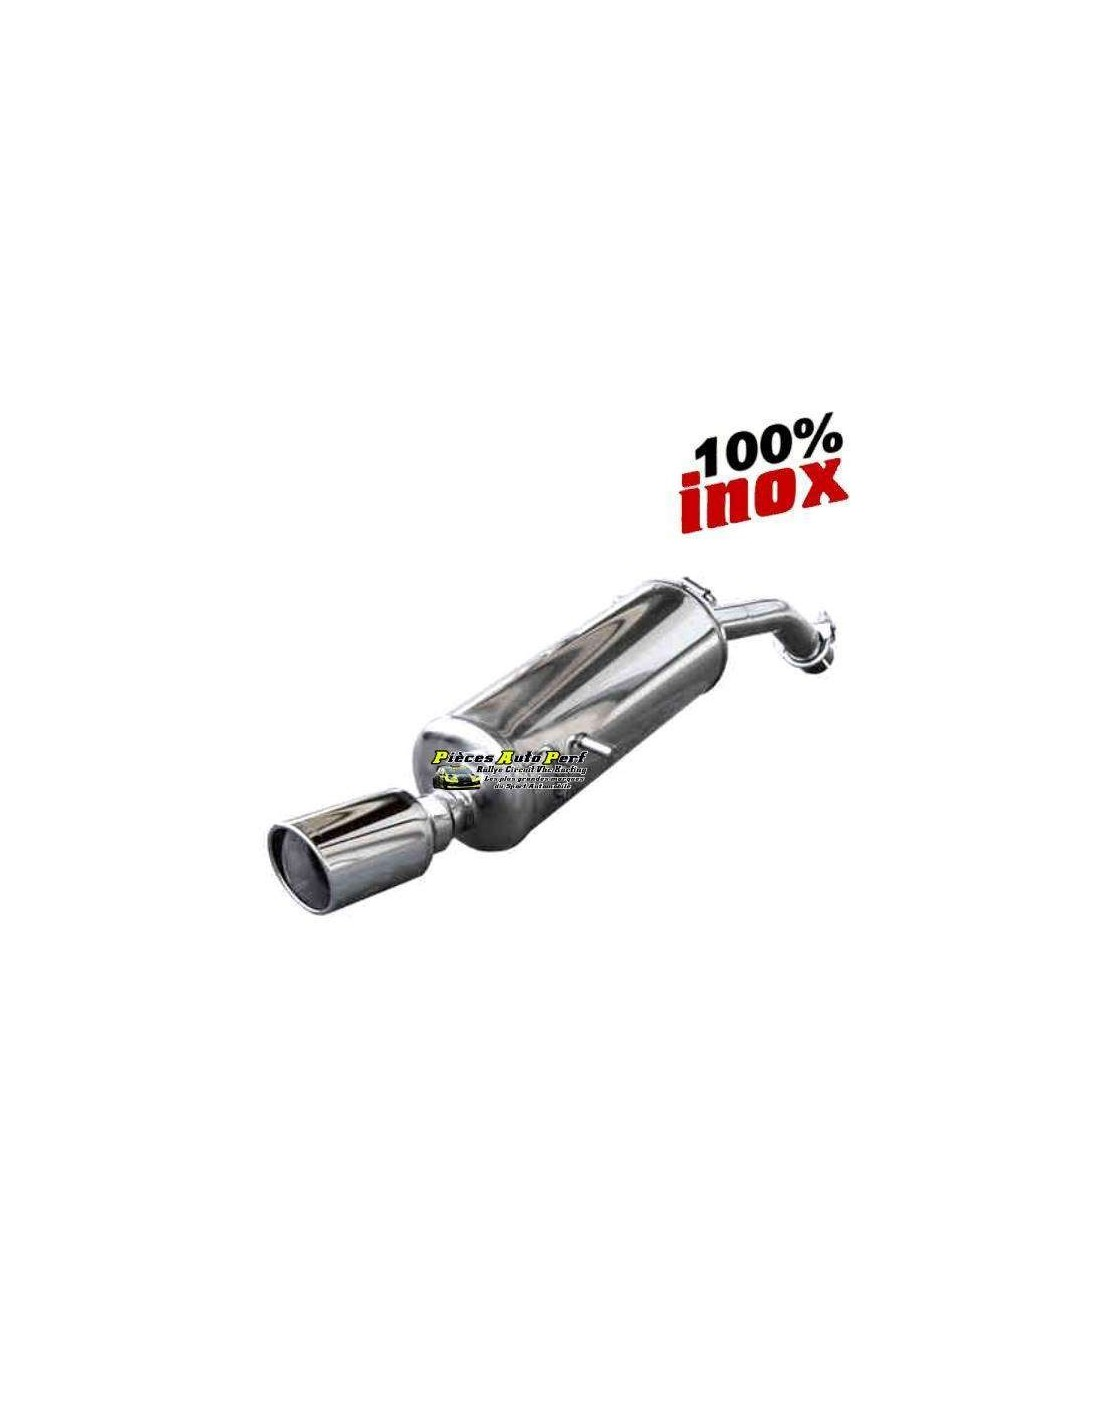 Silencieux Homologué Inox 1 sortie X-Race 90mm Citroen